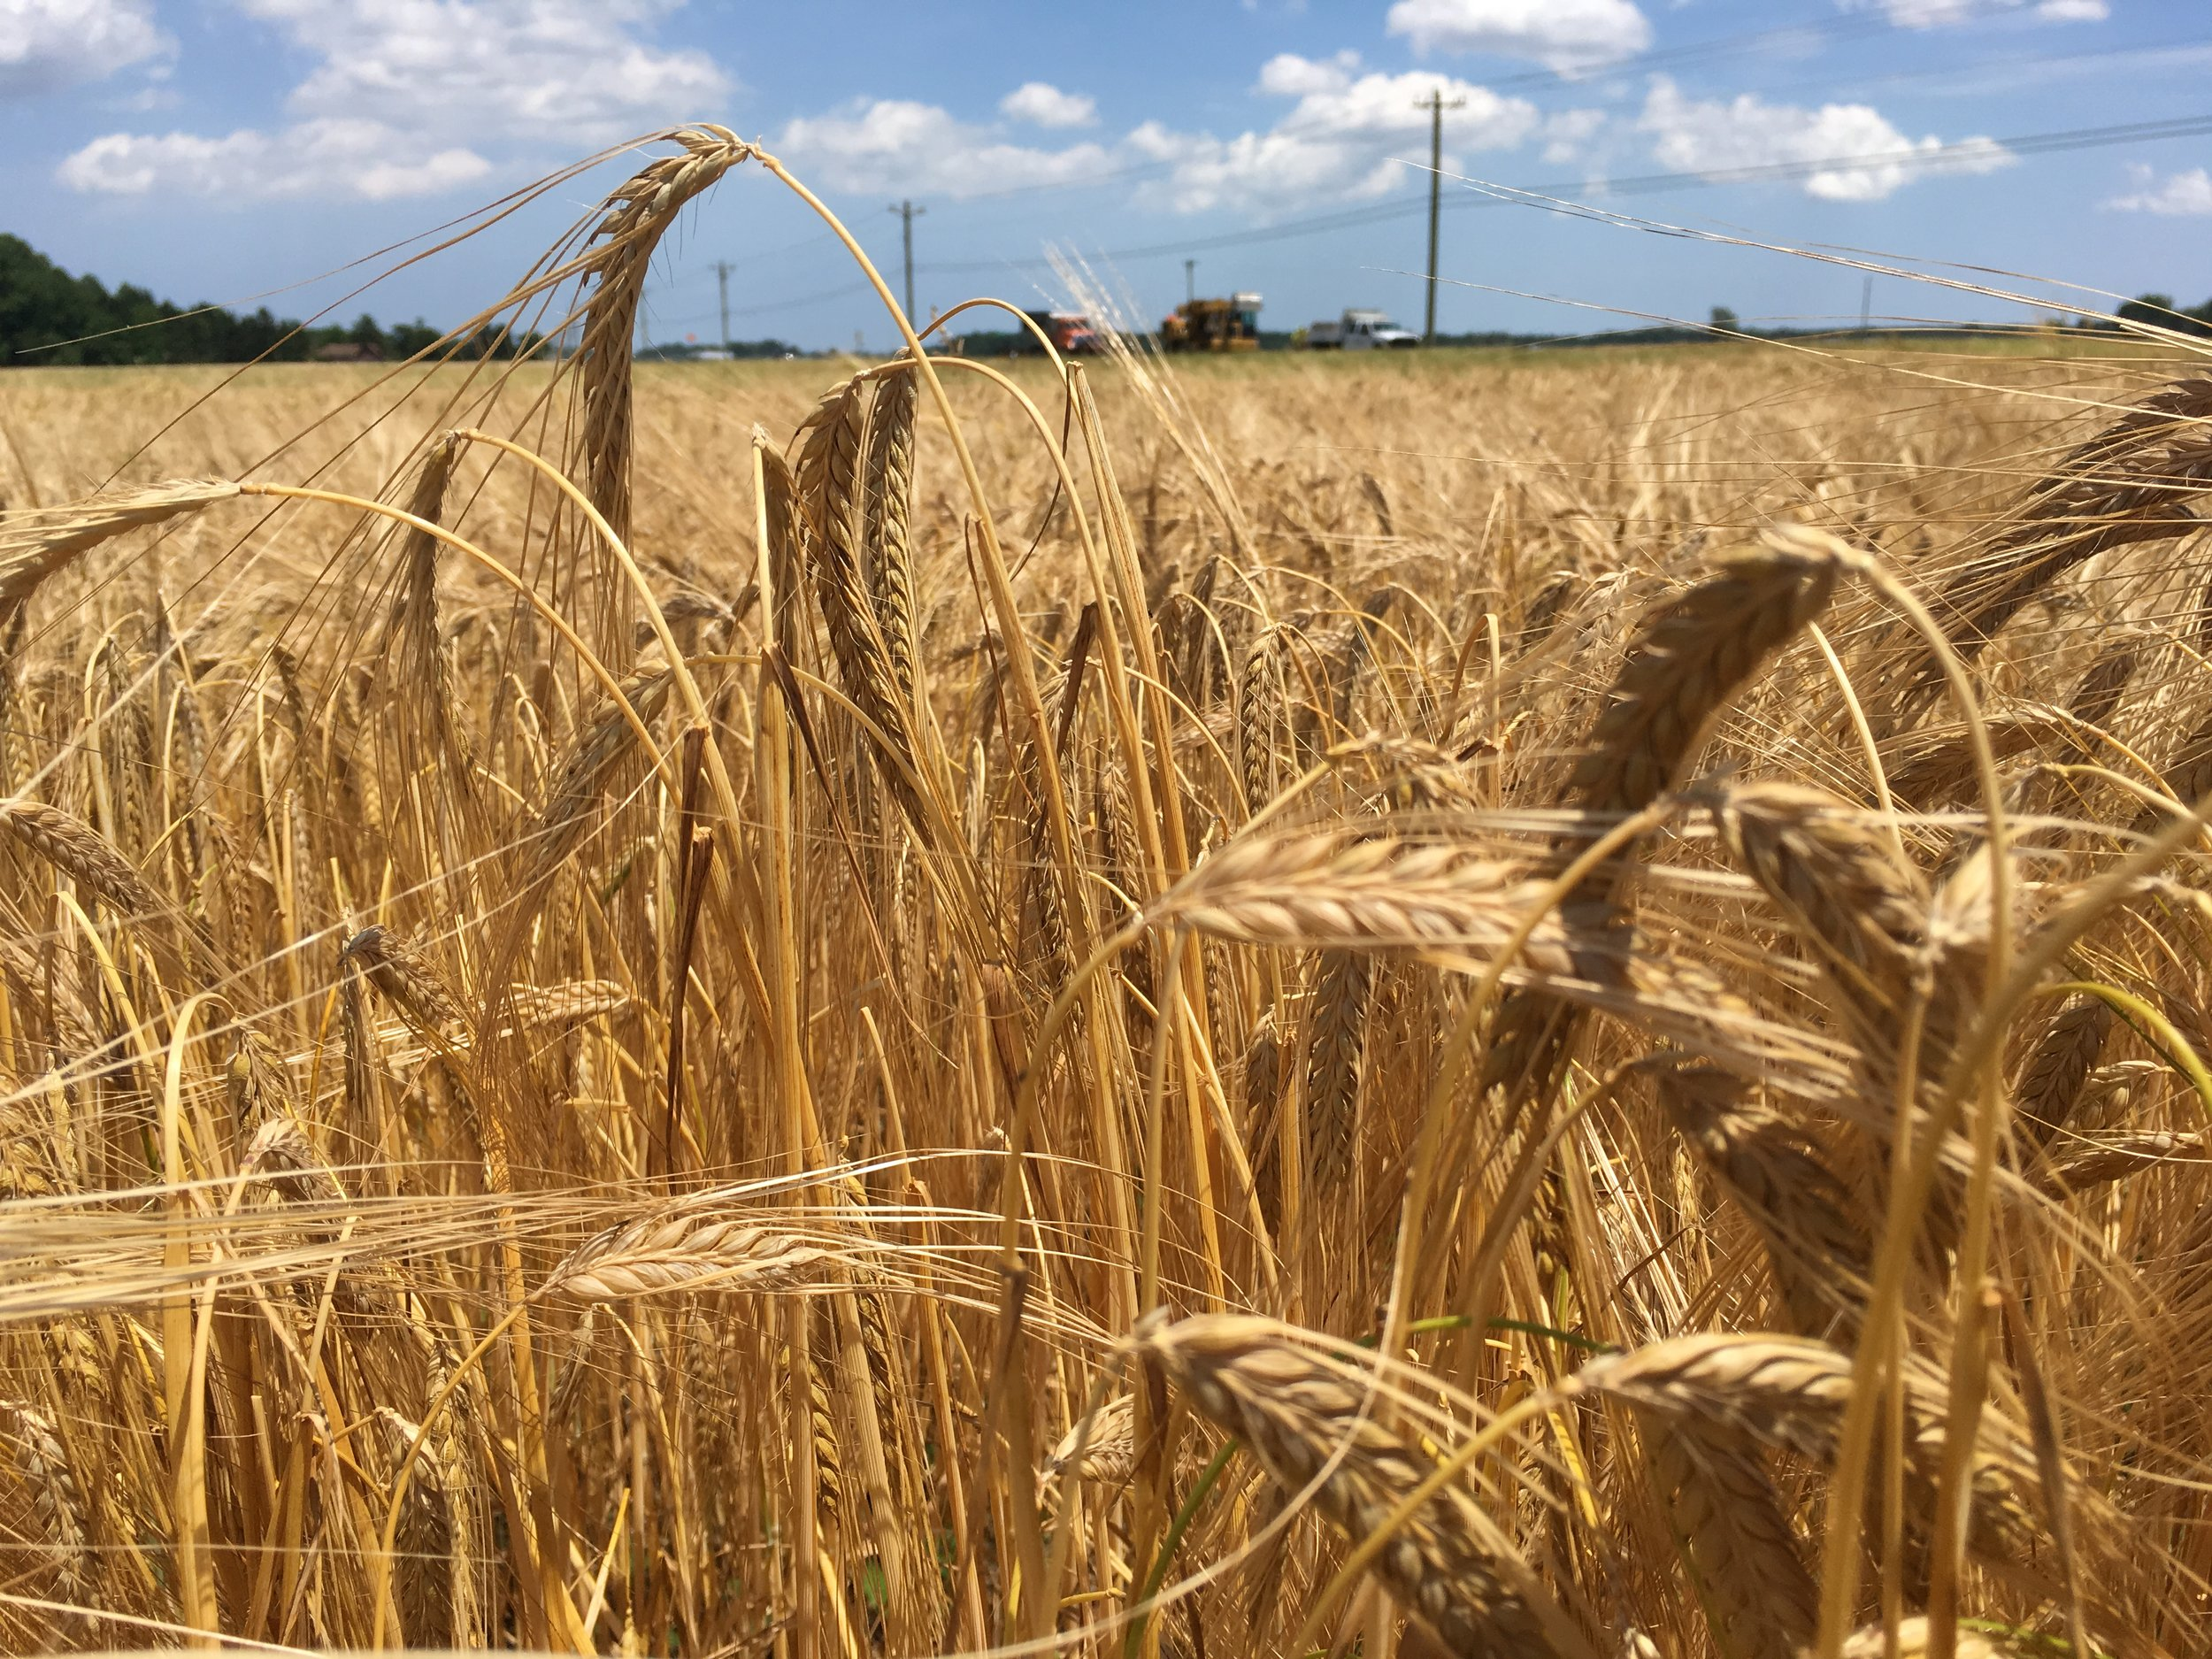 Winter barley ready for harvest in Georgetown, DE.